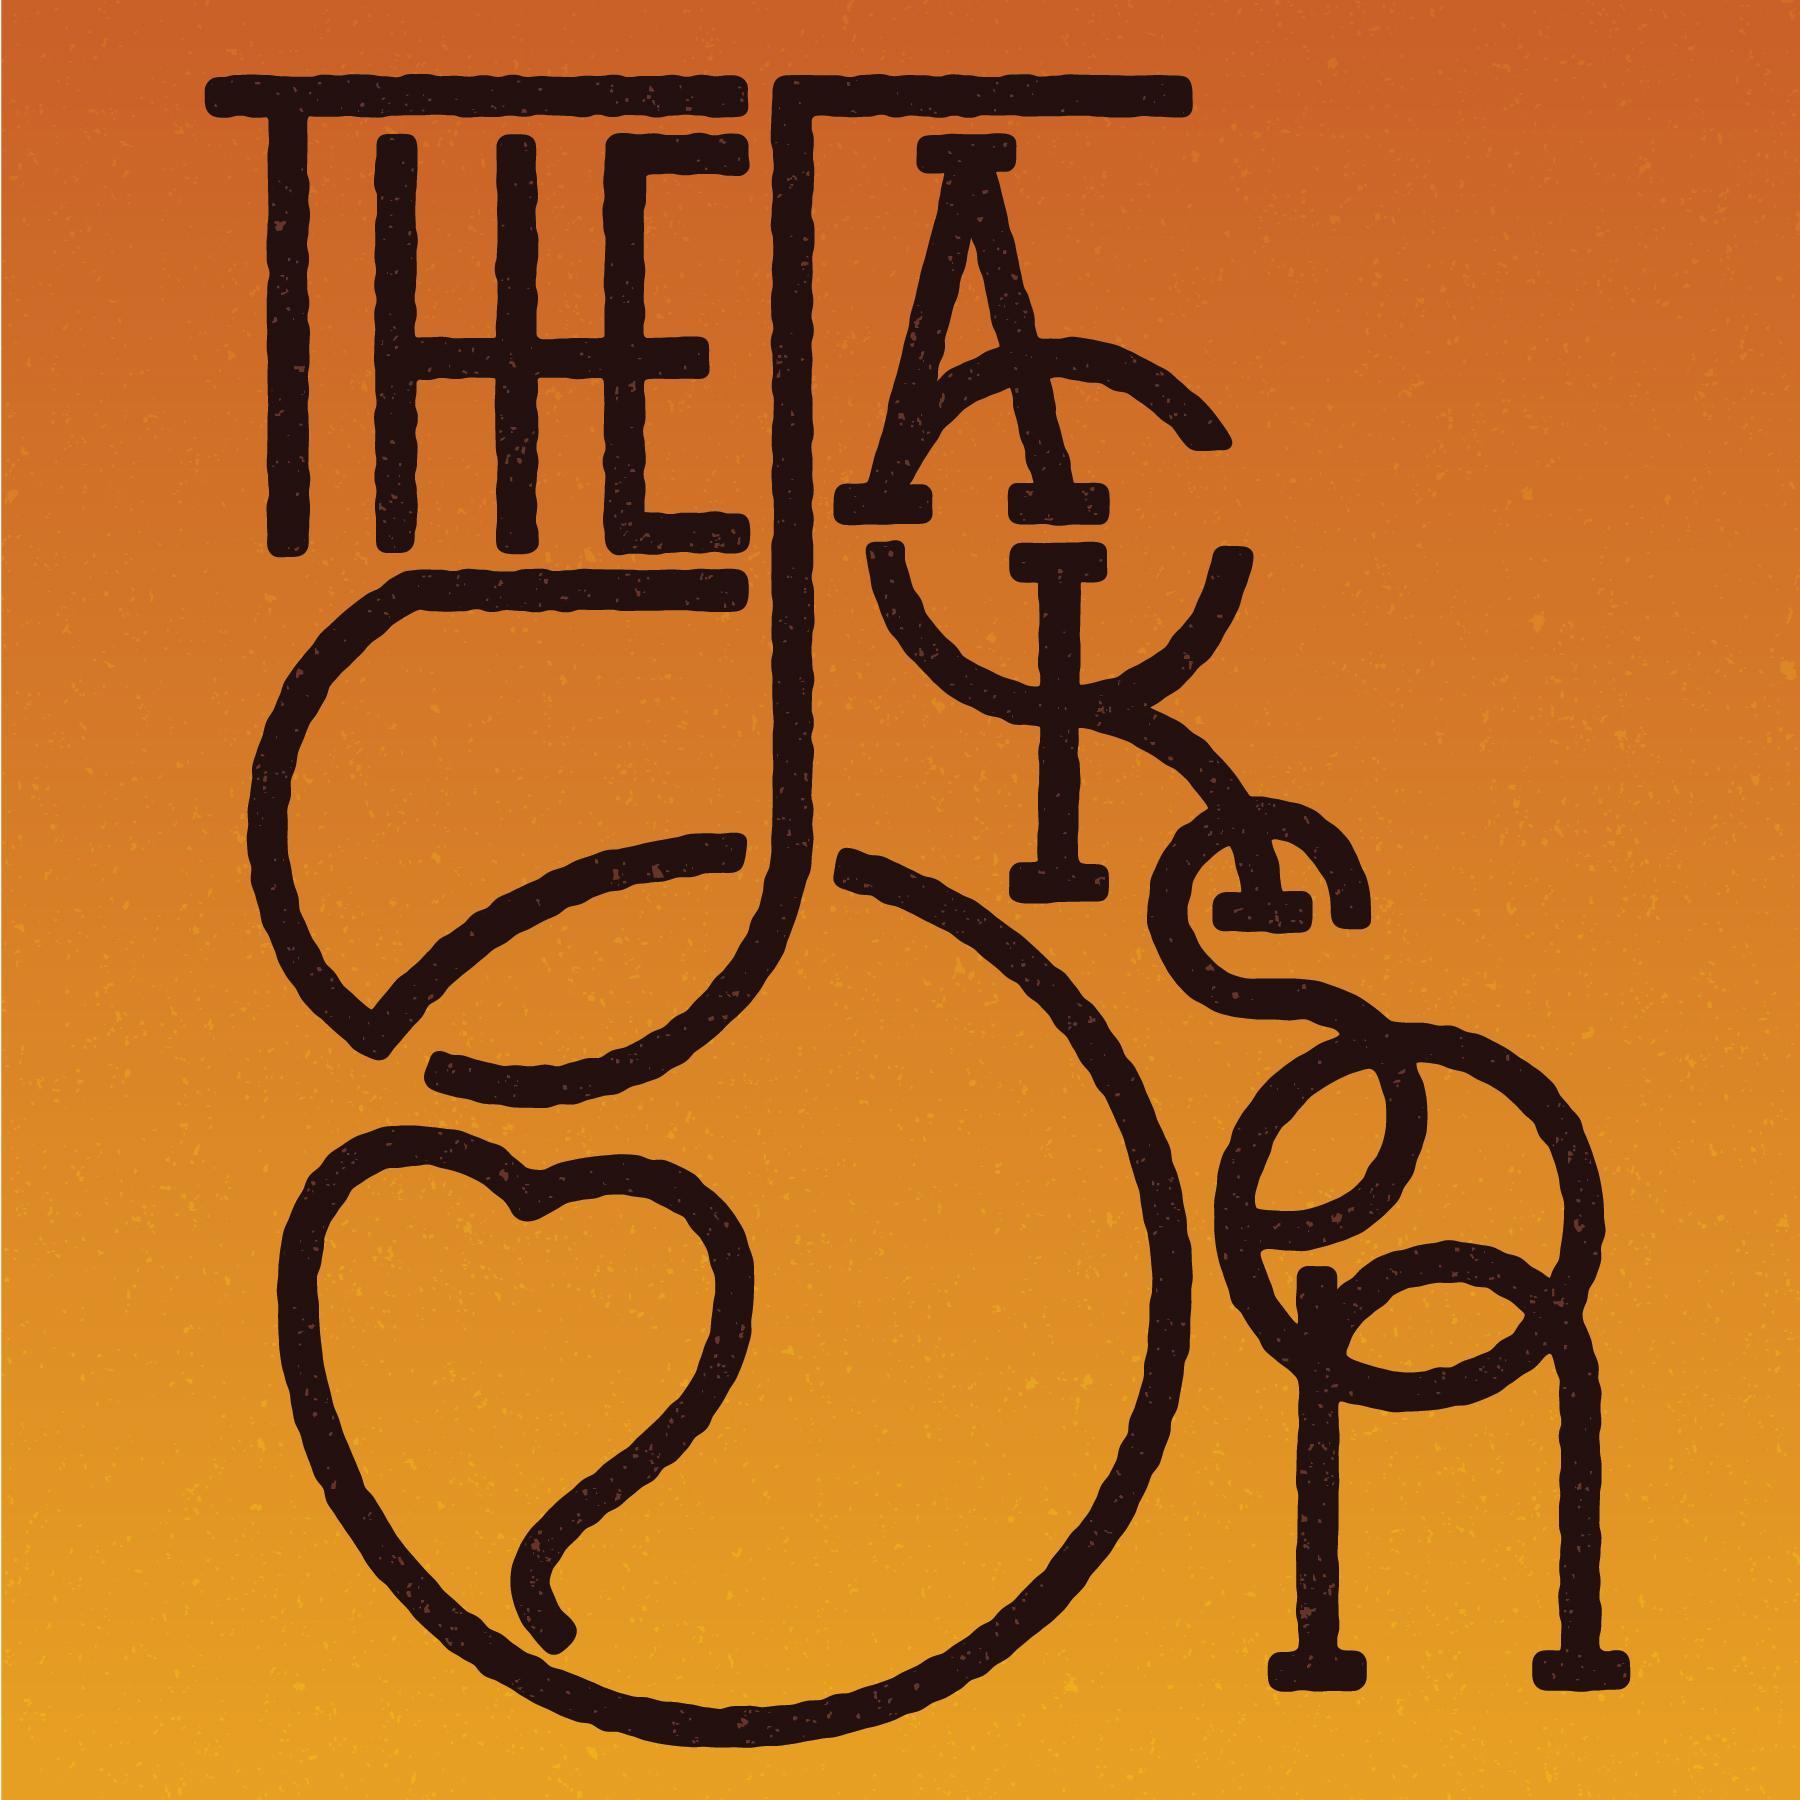 Jackson 5 / logo reinterpretation  & Tom Petty - Stand Your Ground    - image 17 - student project